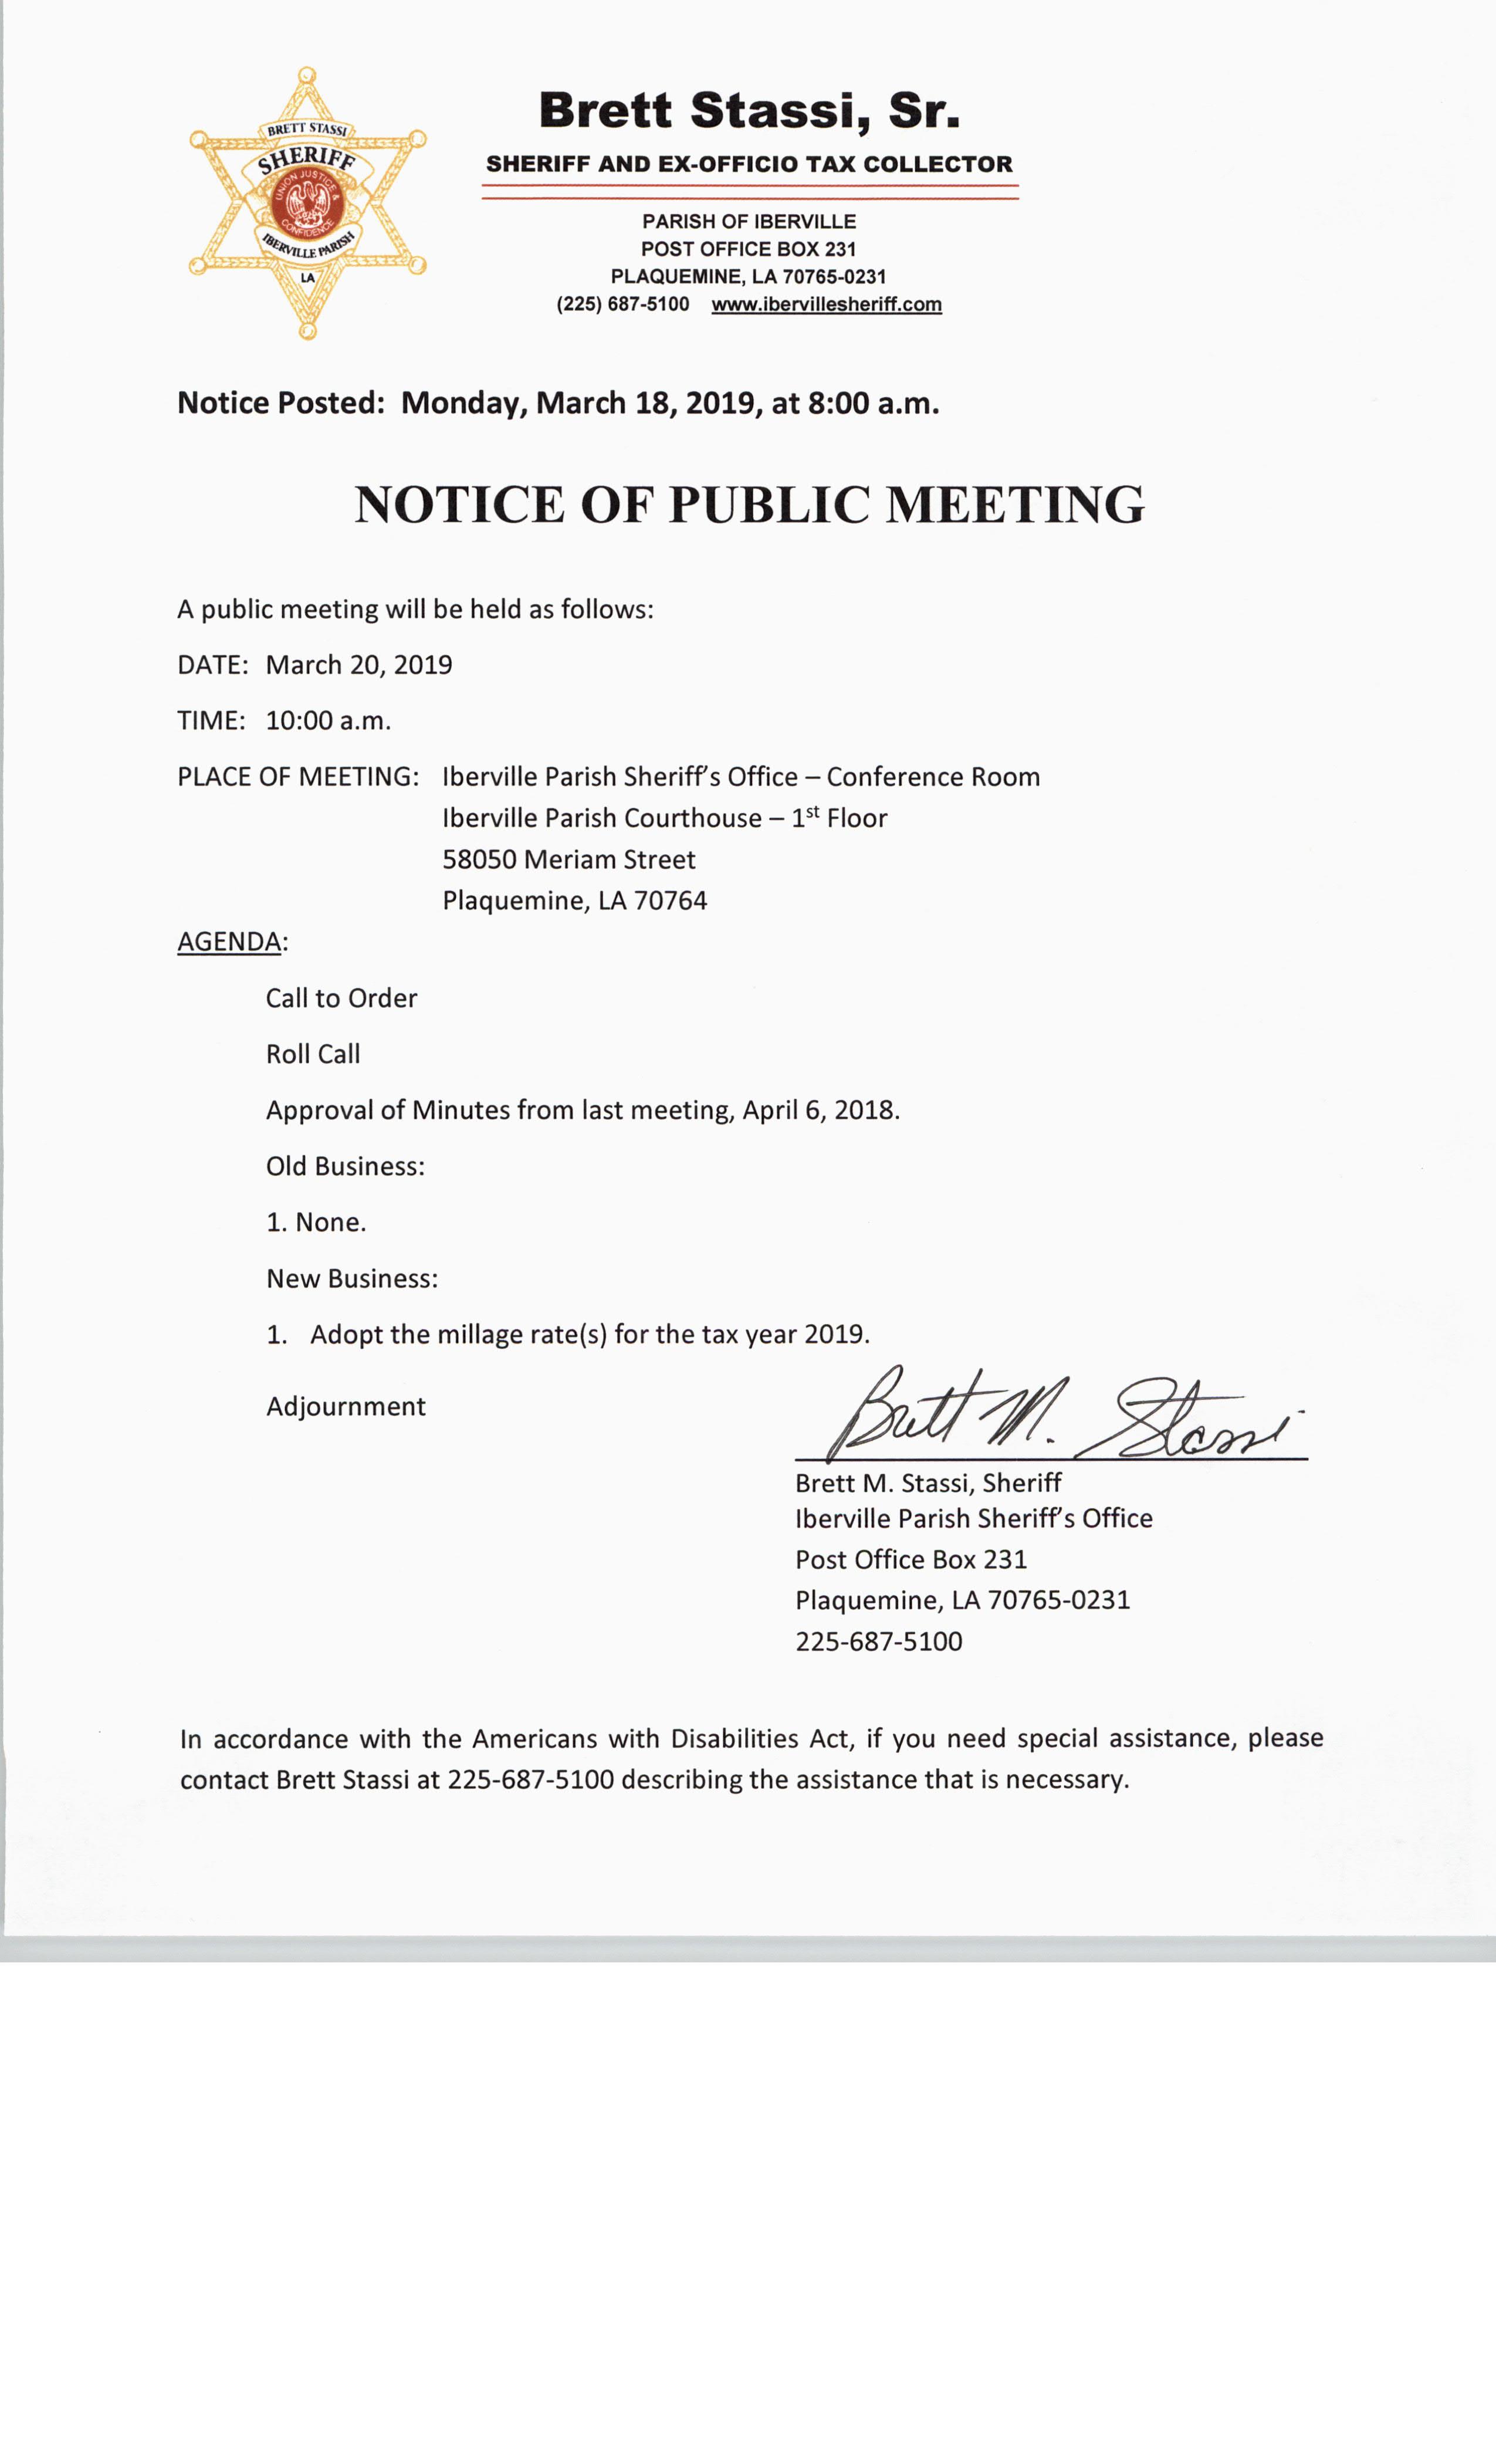 Public Meeting http://www.ibervillesheriff.com/3321-2/public-meeting-2/